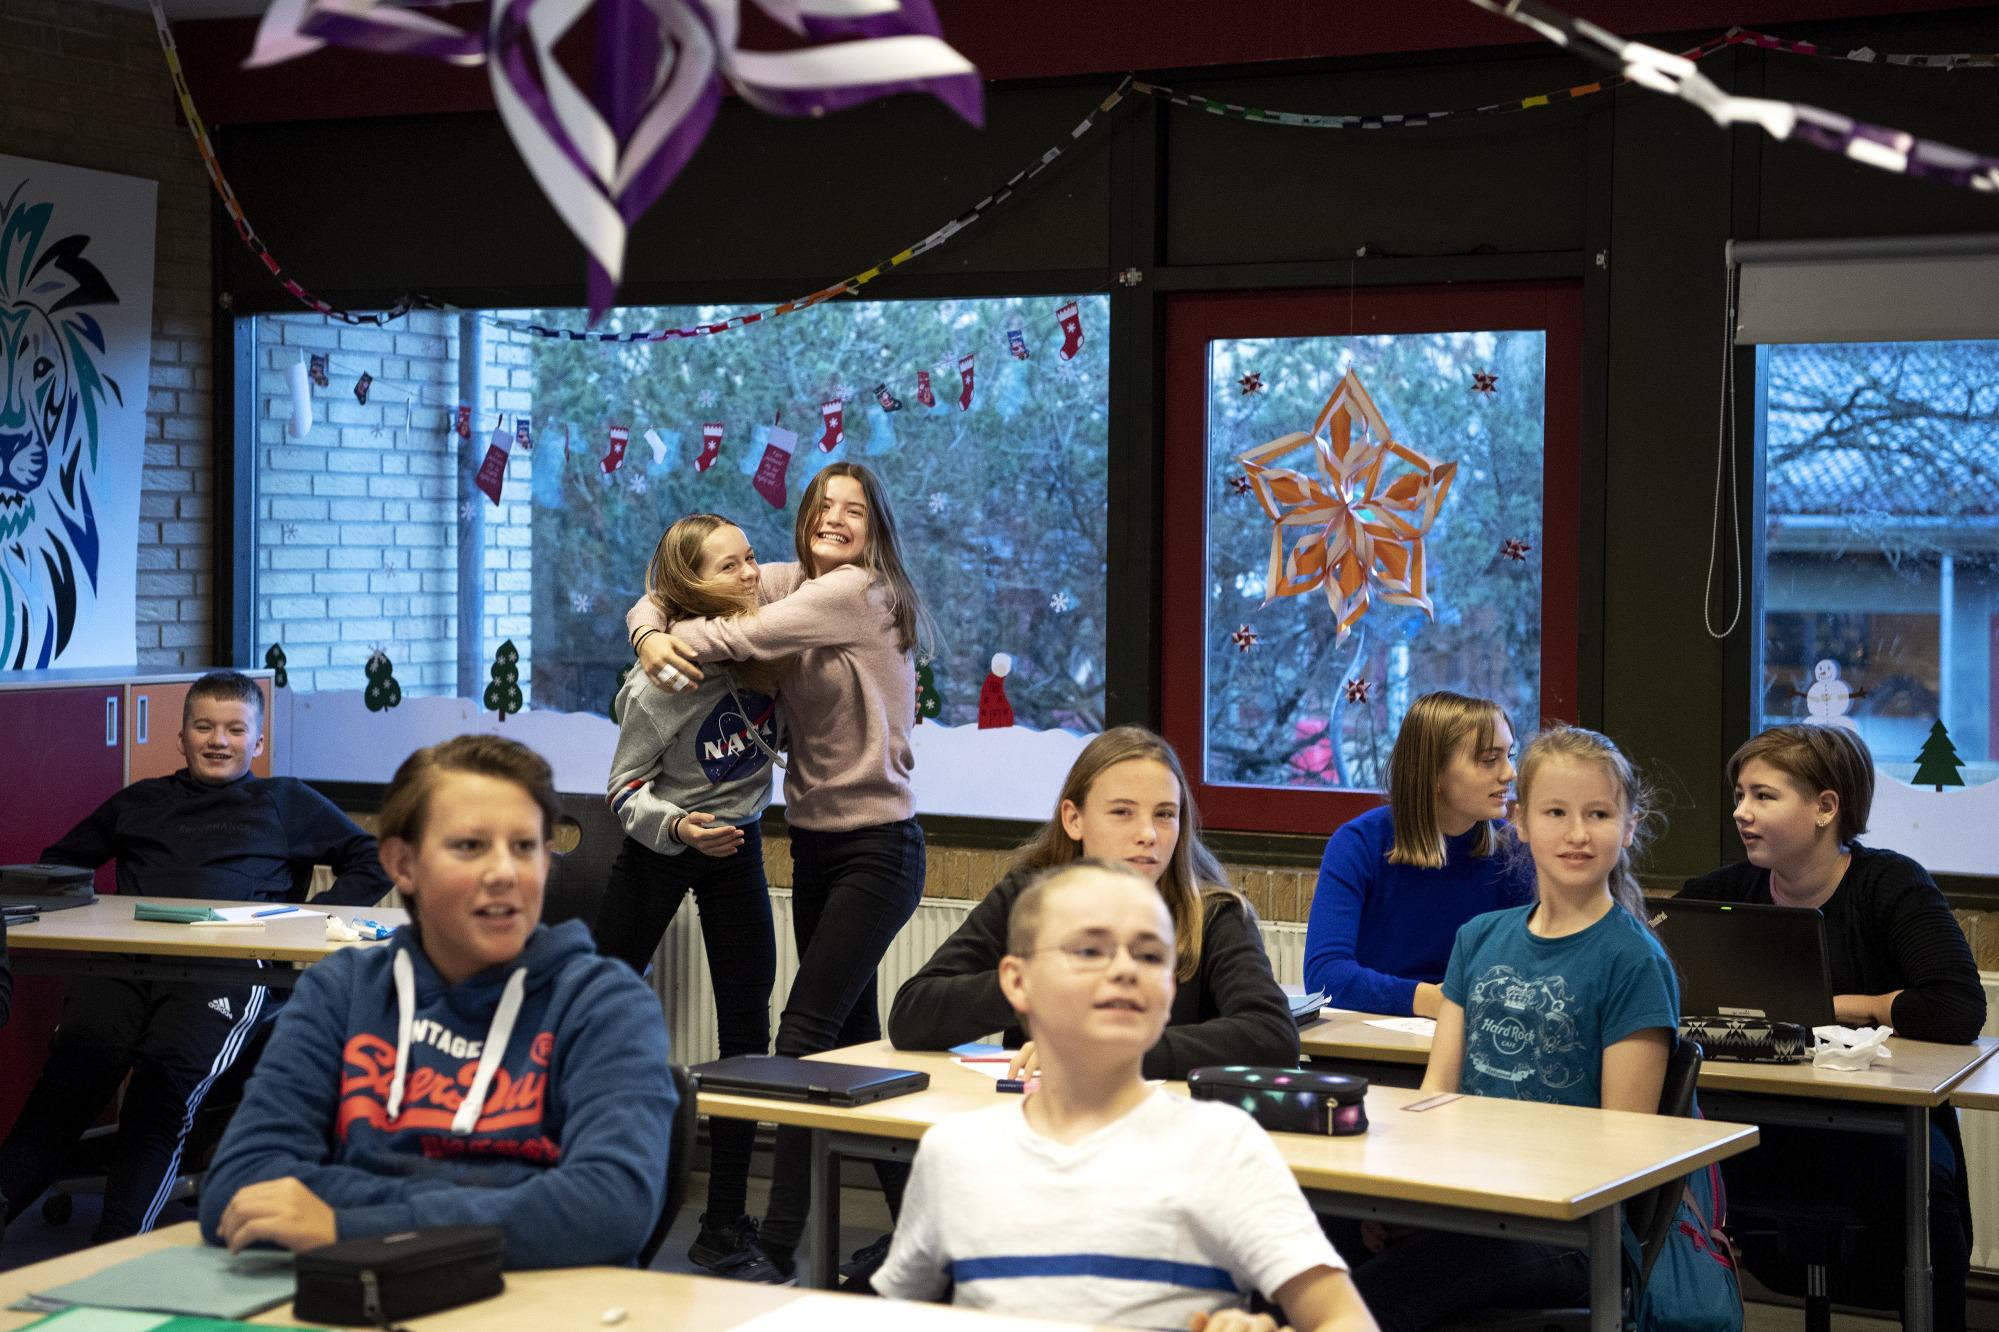 Nordjyske elever i avisdyst: Overrasket med penge til klassekassen